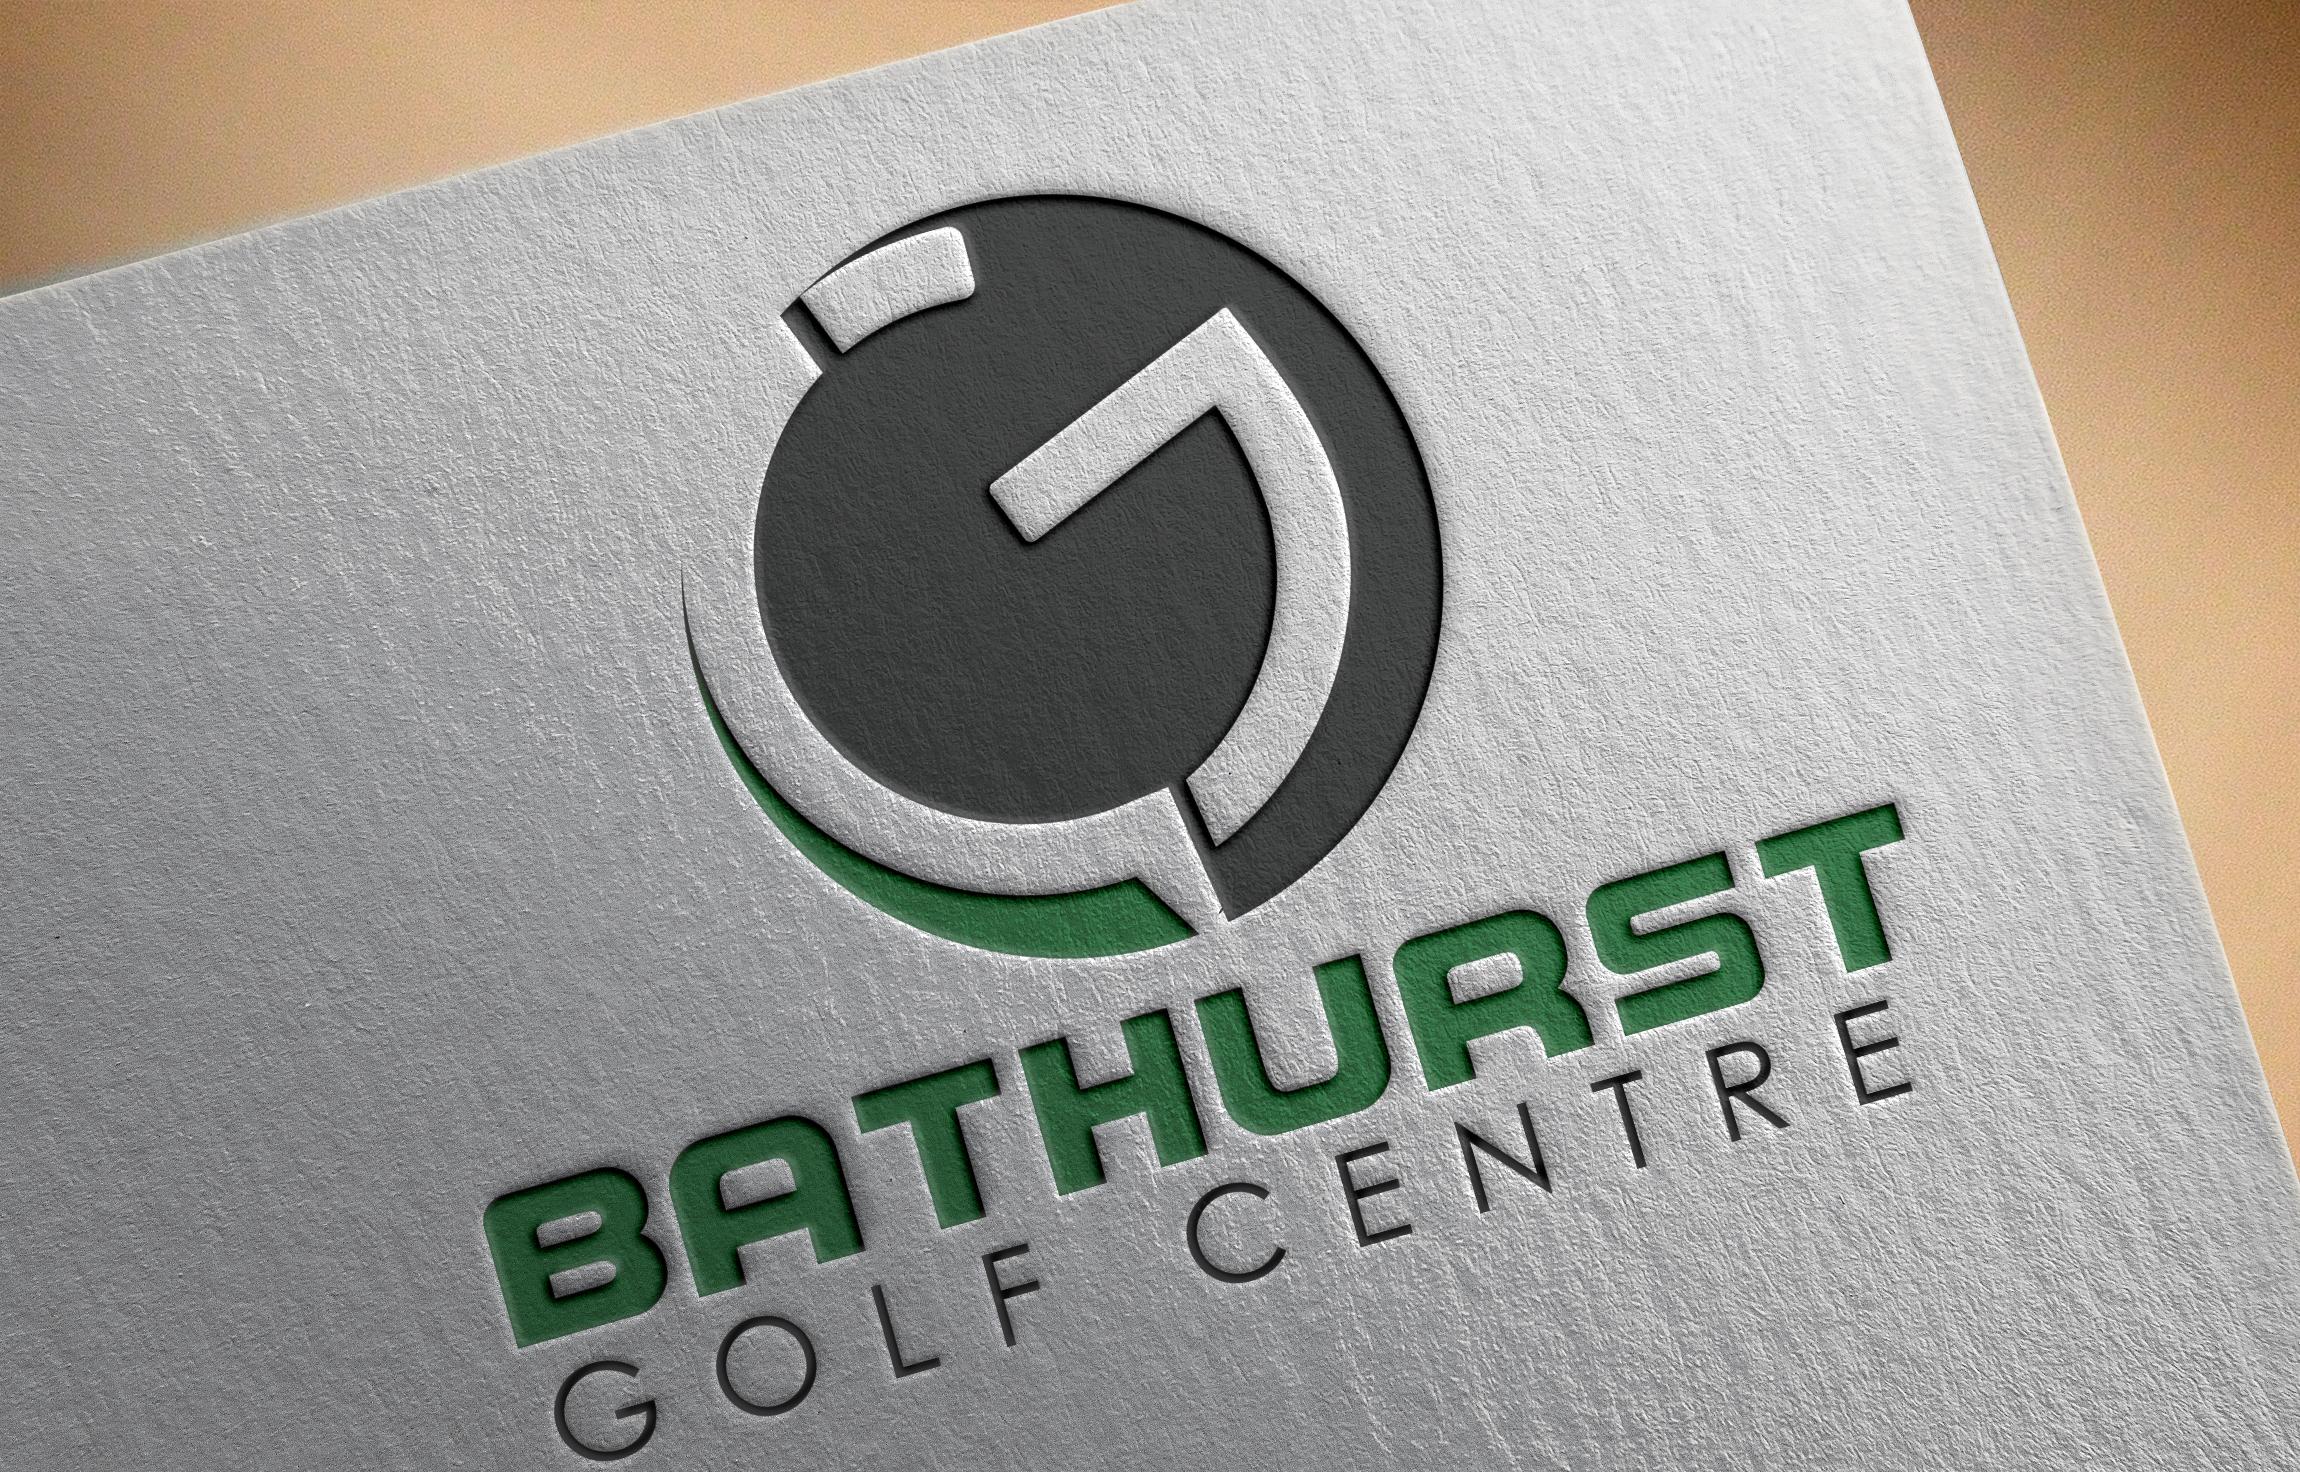 Logo Design by Moeed Khan - Entry No. 65 in the Logo Design Contest Inspiring Logo Design for Bathurst Golf Centre.